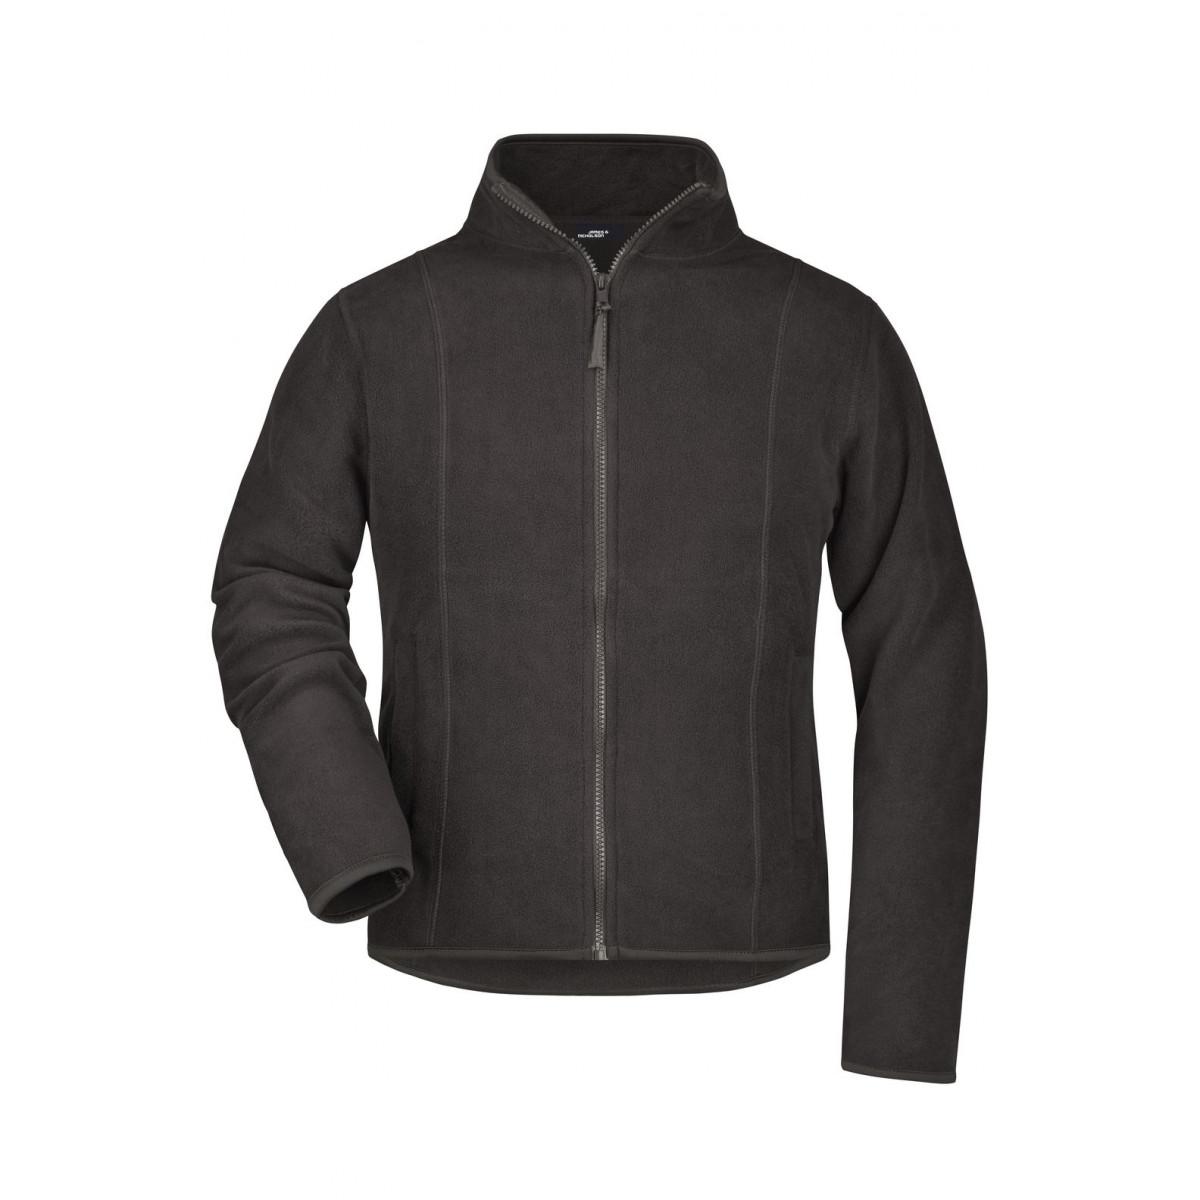 Толстовка женская JN049 Girly Microfleece Jacket - Темно-серый